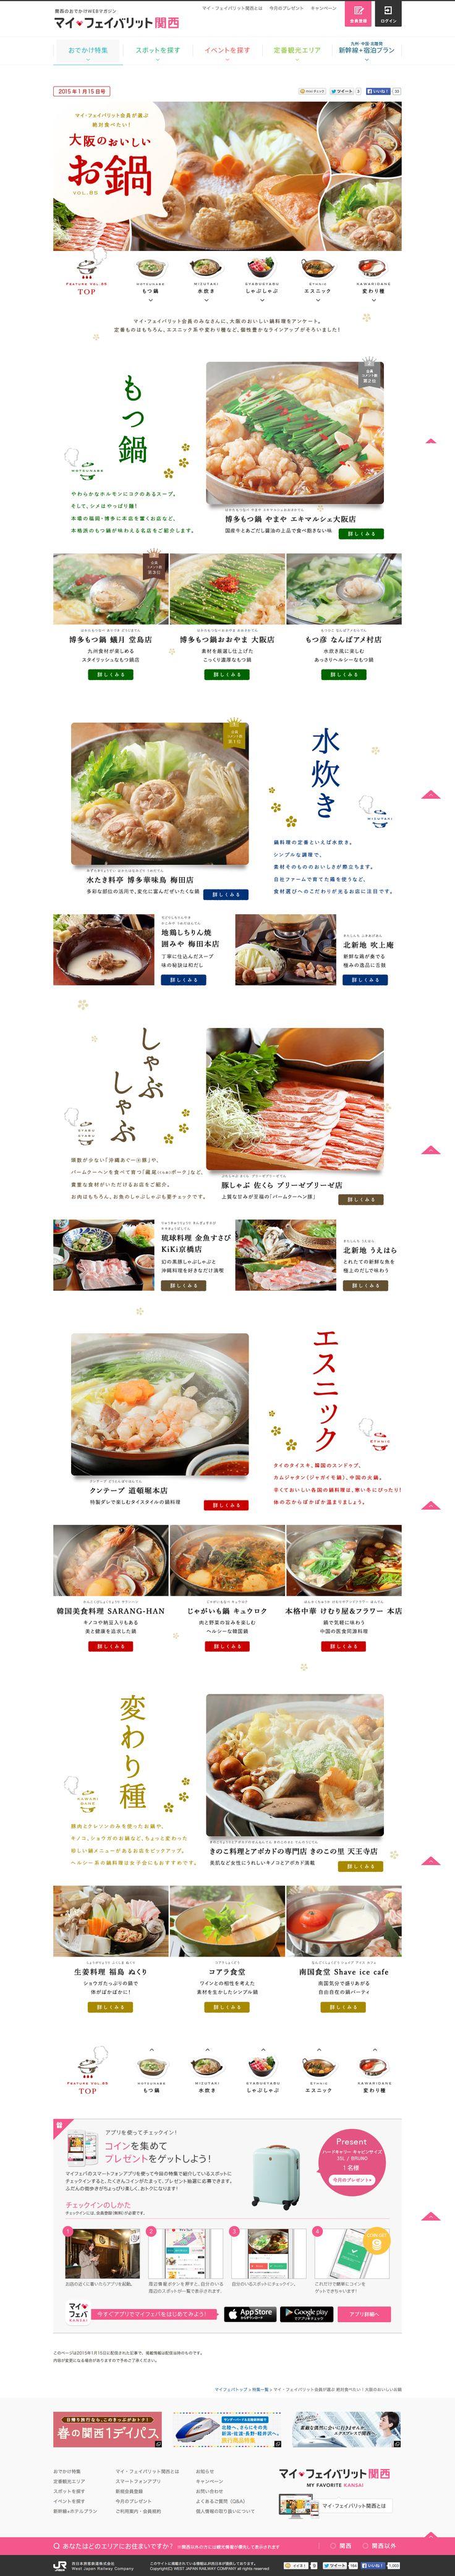 http://www.my-fav.jp/feature/85/shabushabu/